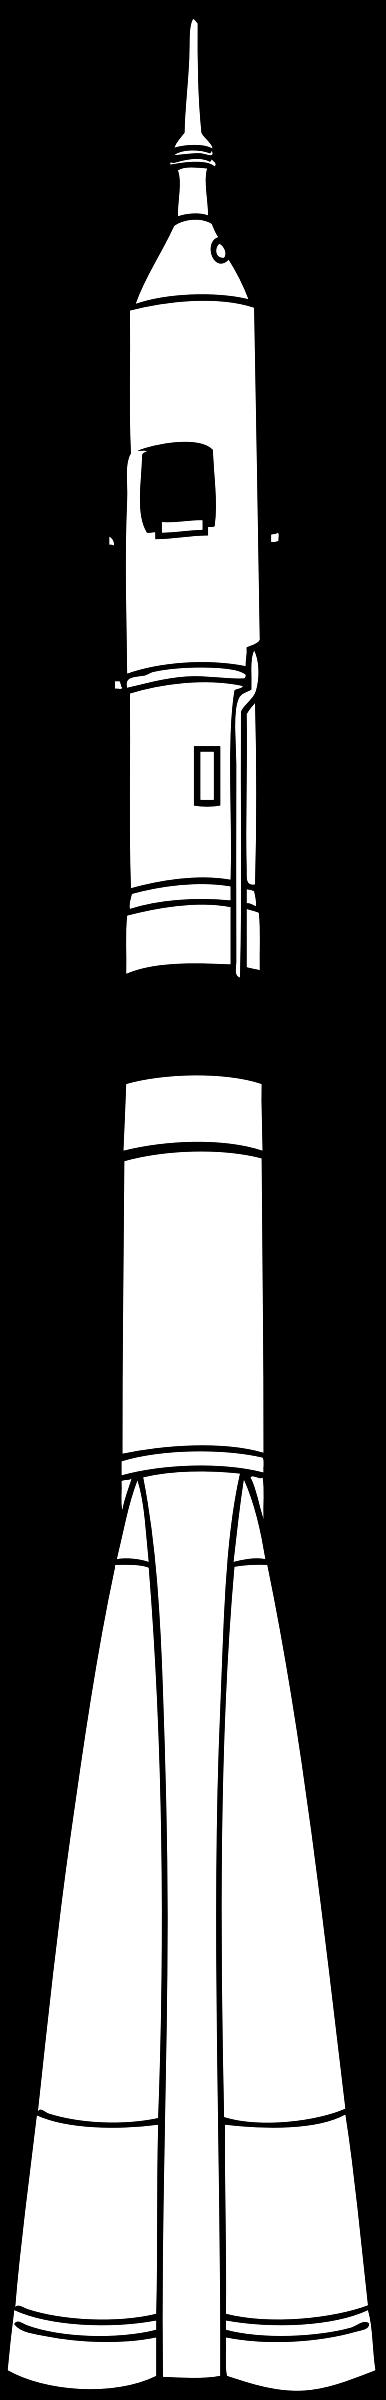 Soyuz big image png. Clipart rocket drawing